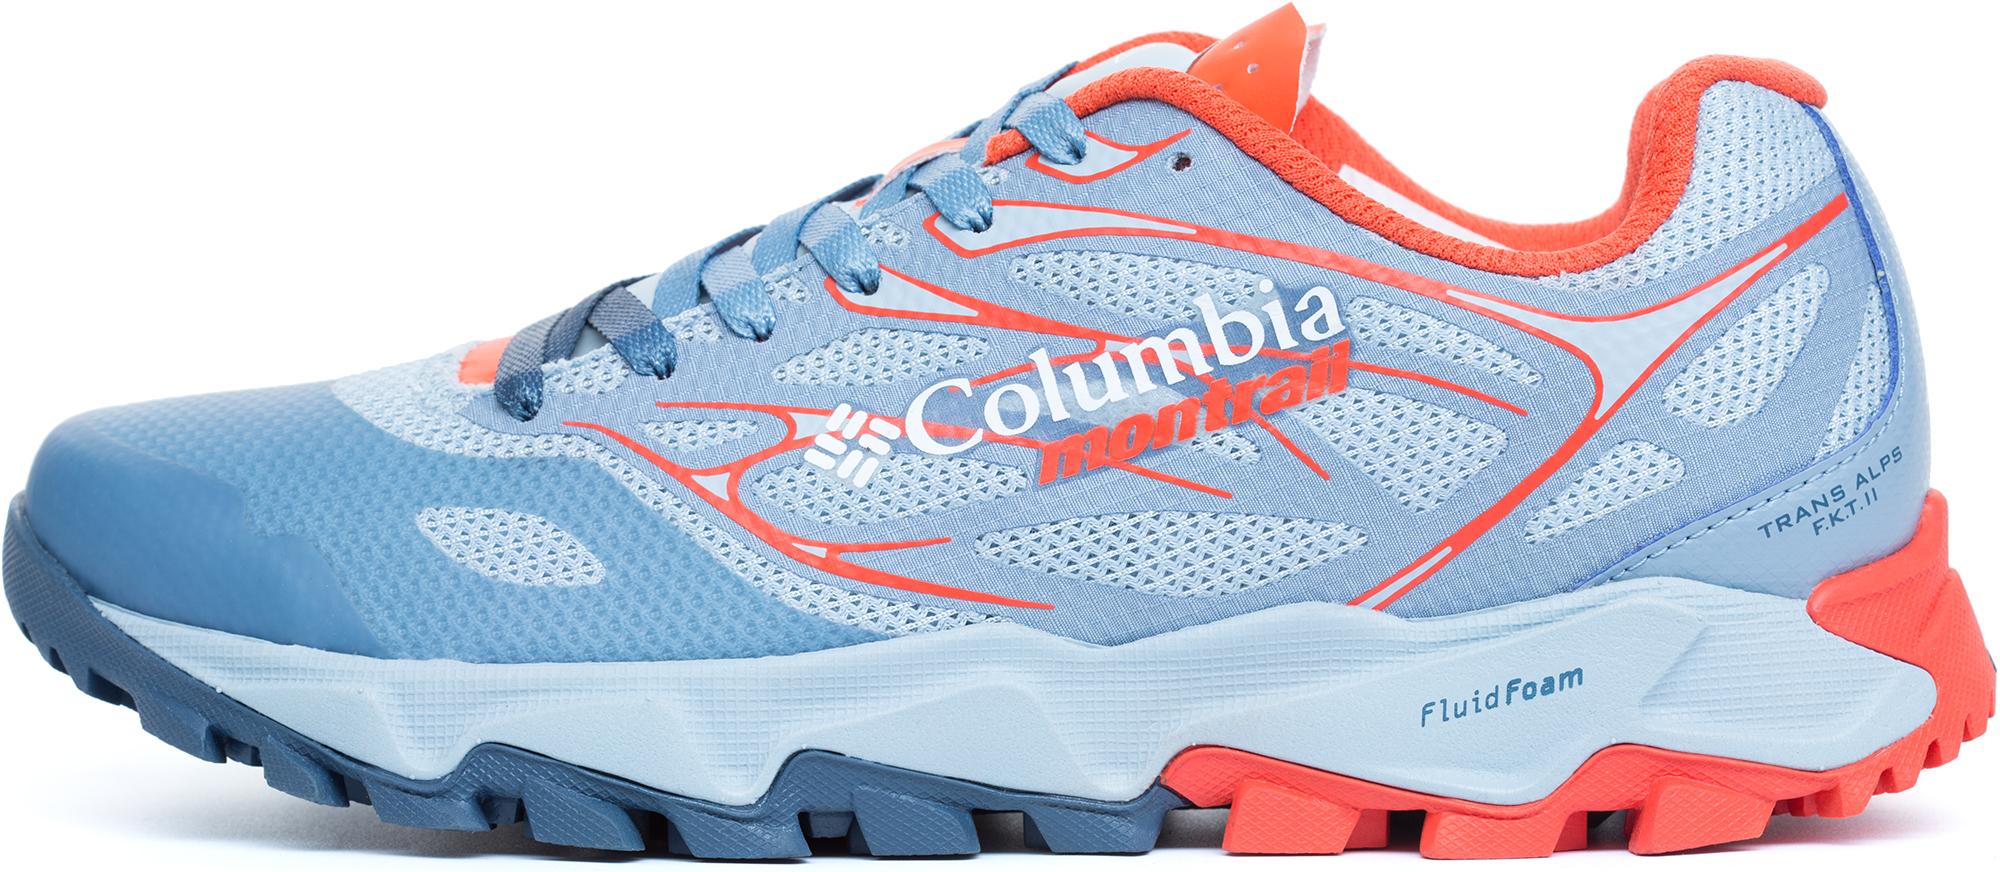 Columbia Кроссовки женские Columbia Trans Alps F.K.T. II, размер 37.5